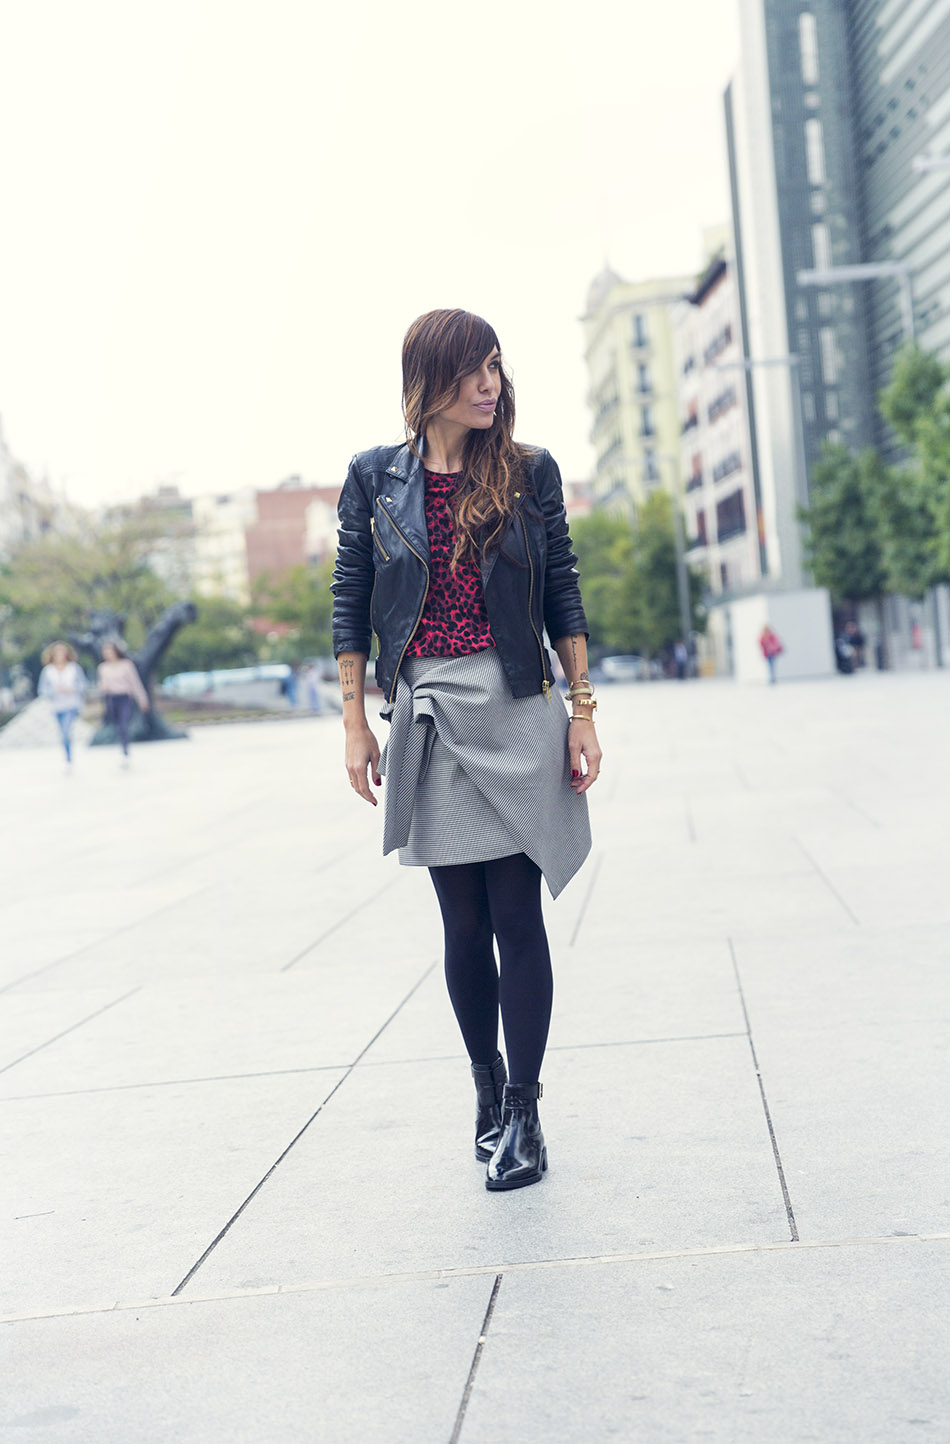 street-style-bimba-y-lola-top-zara-skirt-mango-perfecto-02